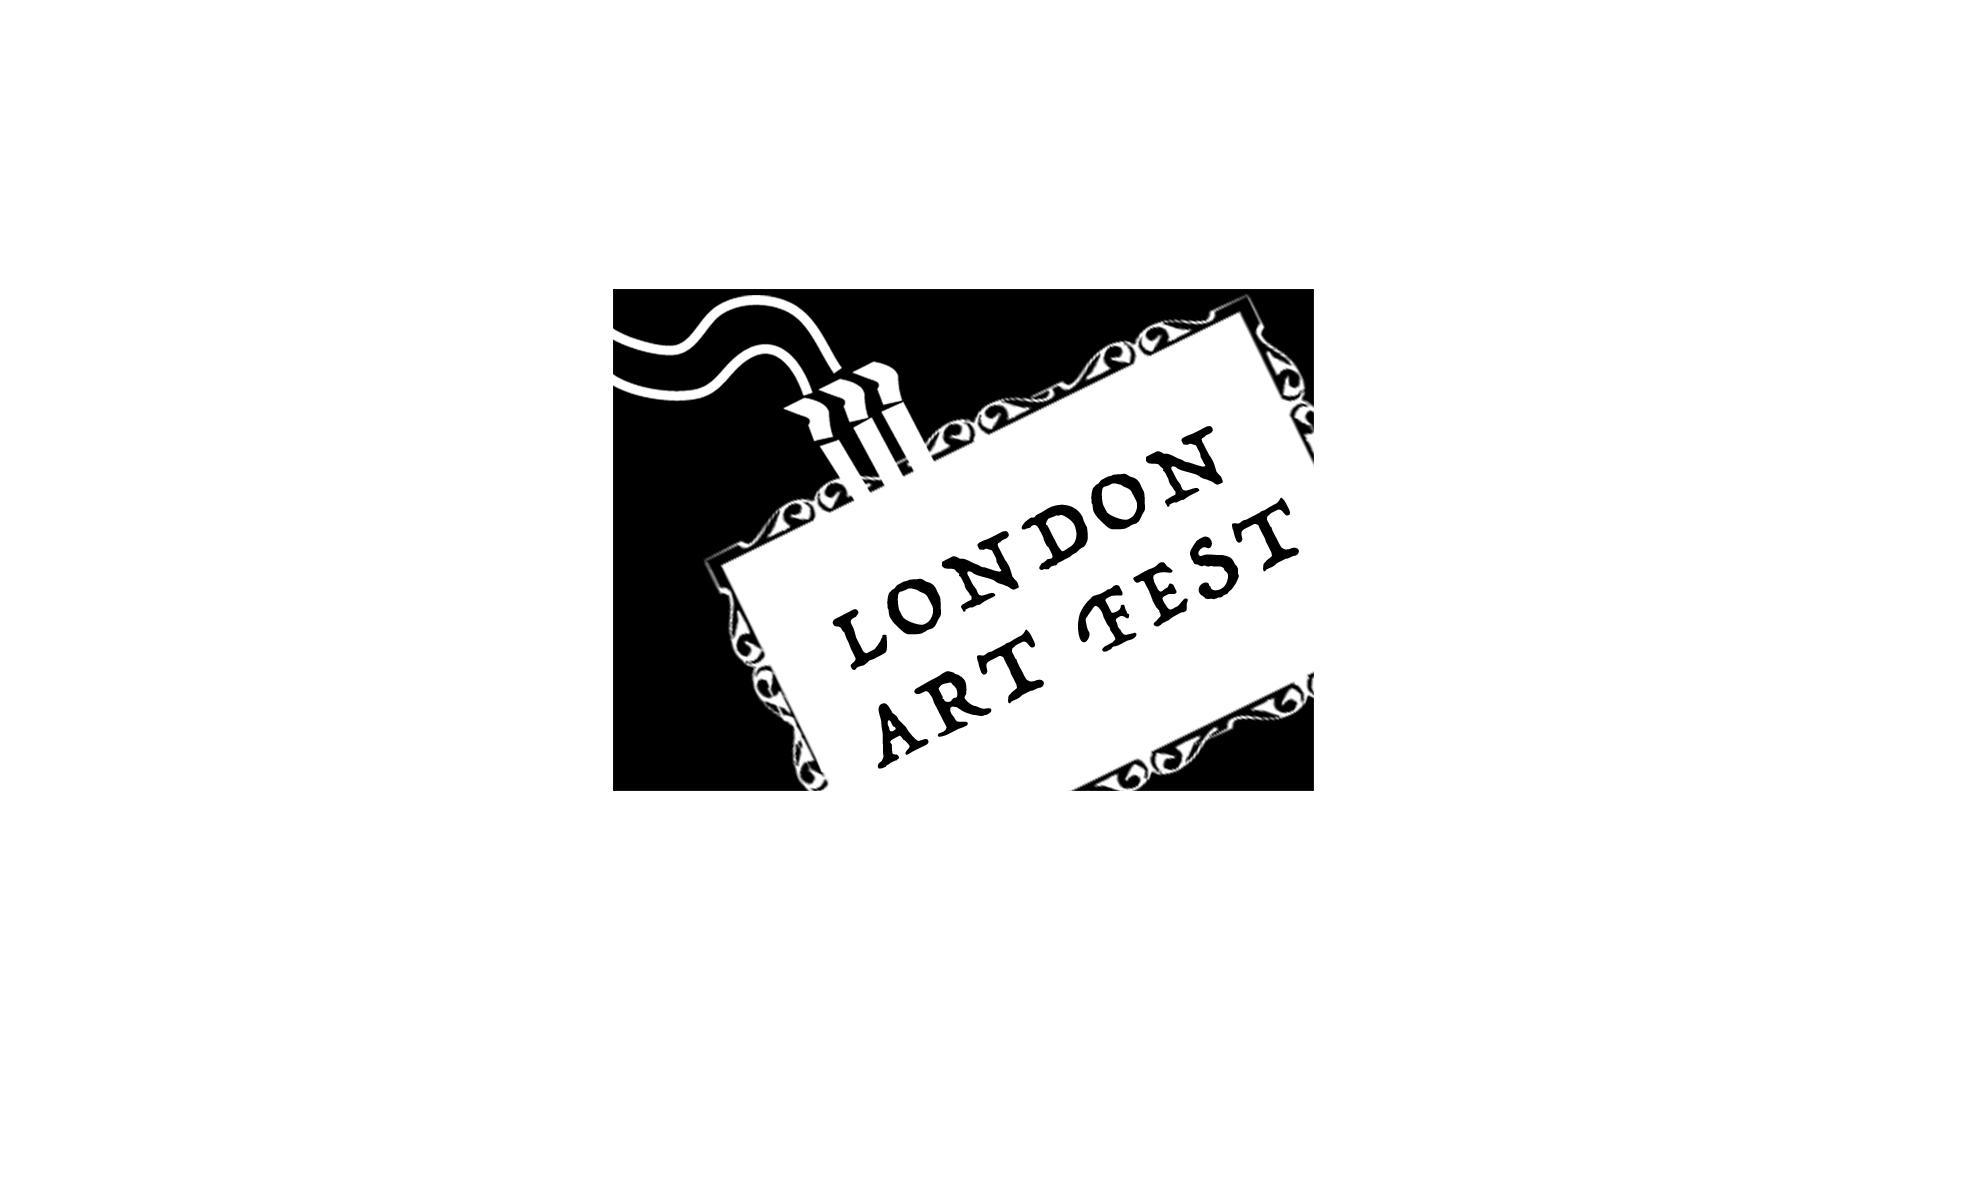 artfestival-logo-design-revised7